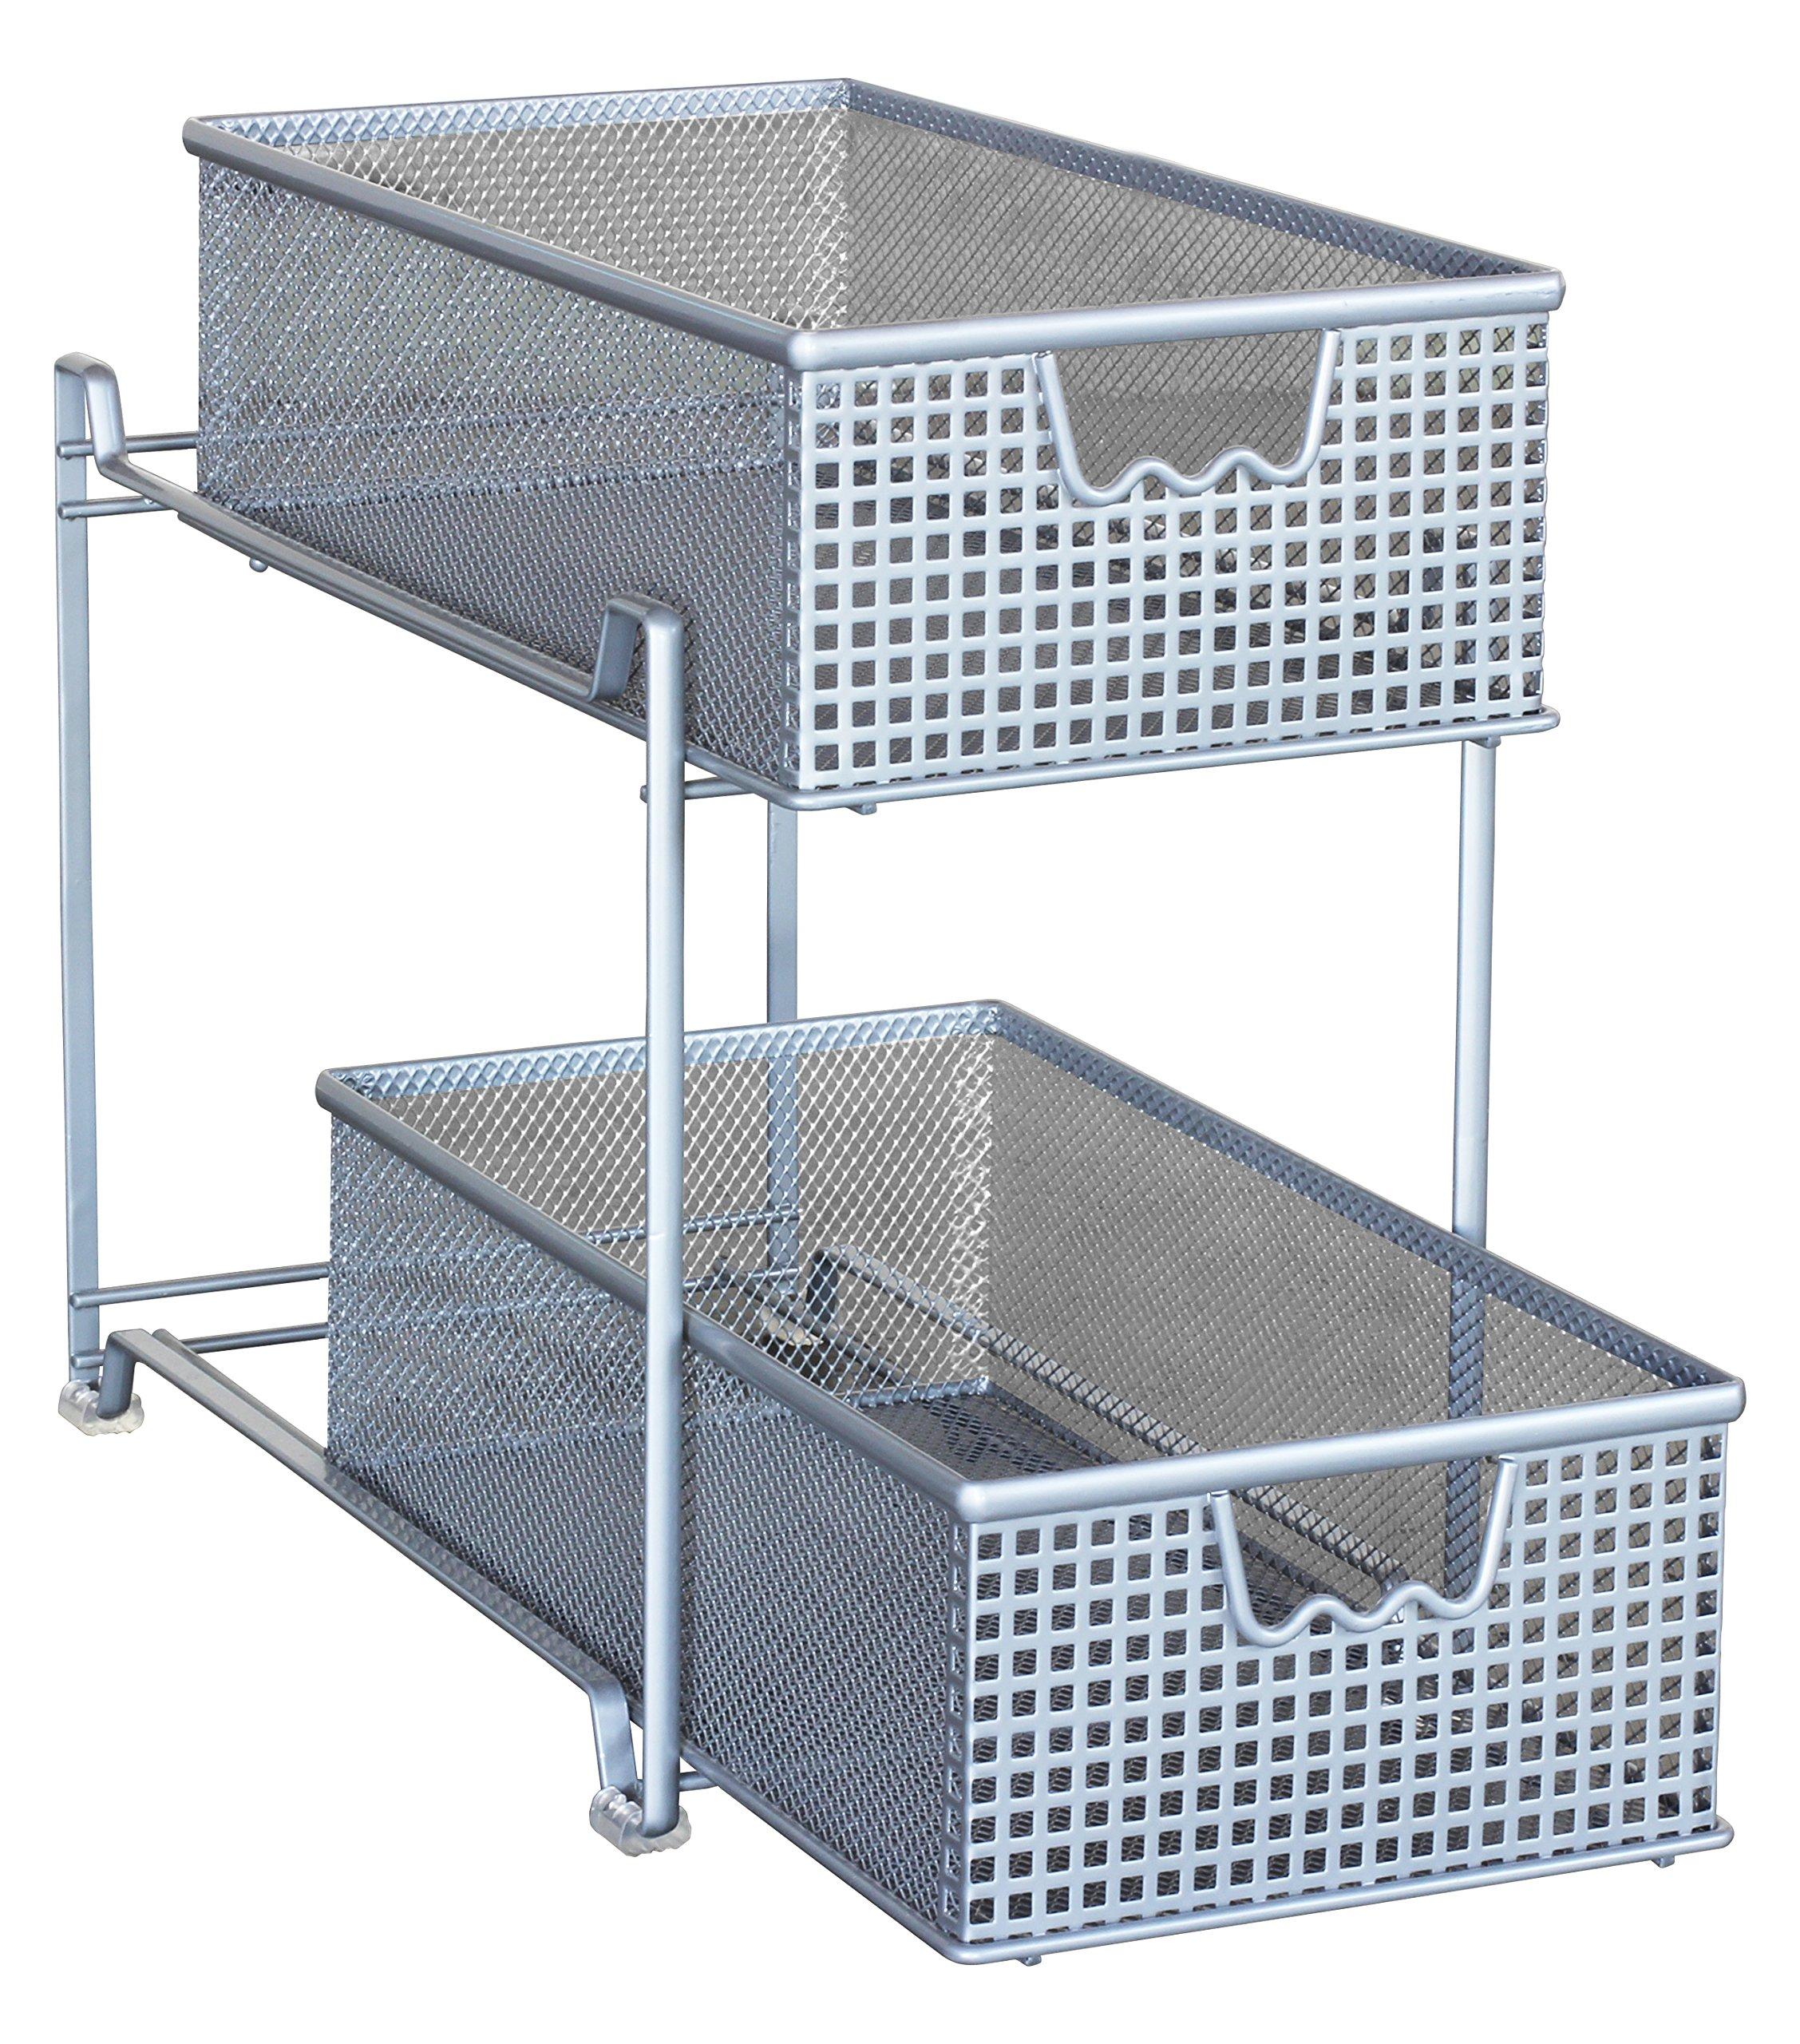 DecoBros 2 Tier Mesh Sliding Cabinet Basket Organizer Drawer,Silver ...